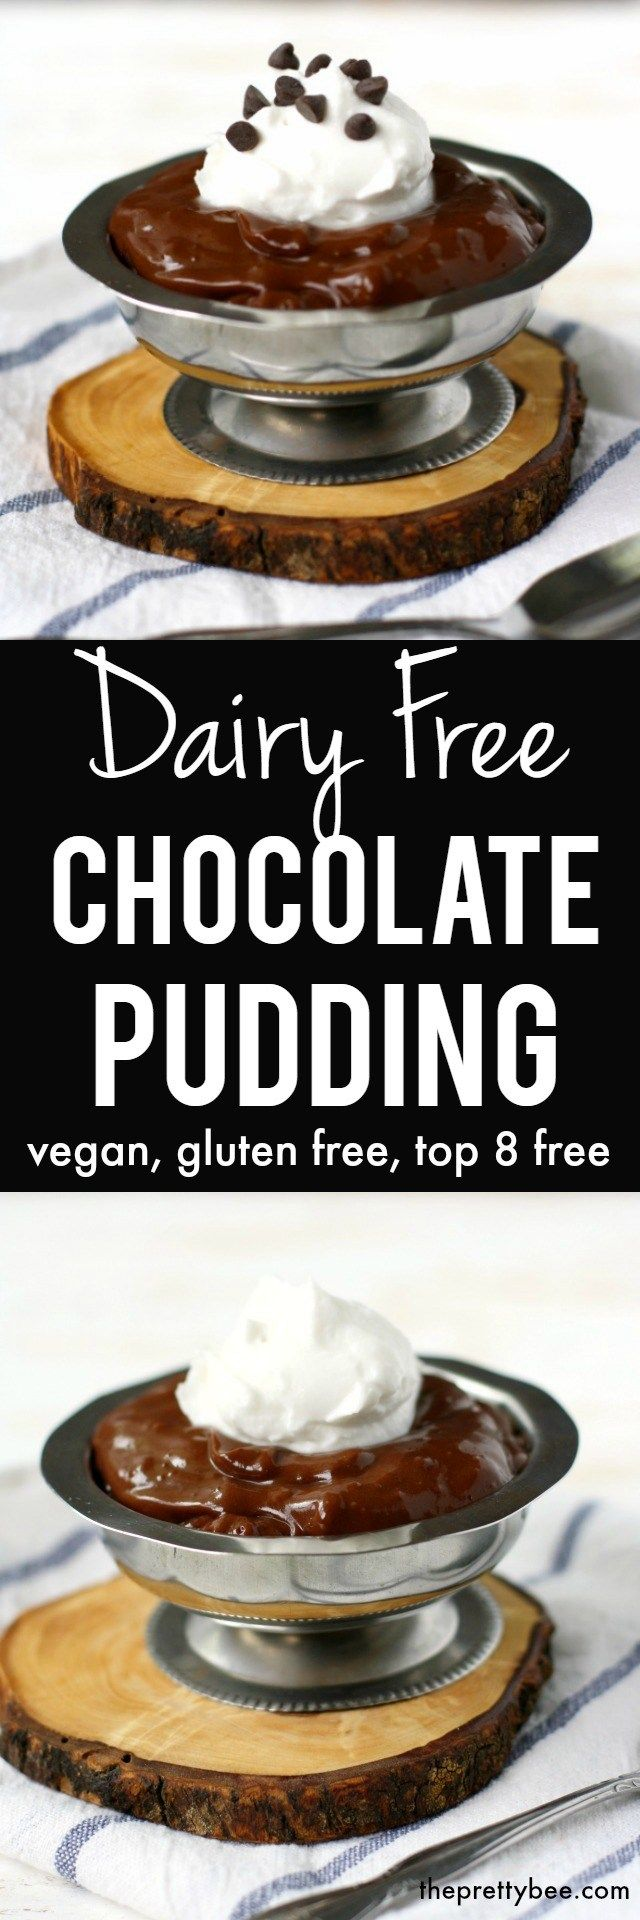 Creamy, delicious, DECADENT dairy free chocolate pudding recipe.